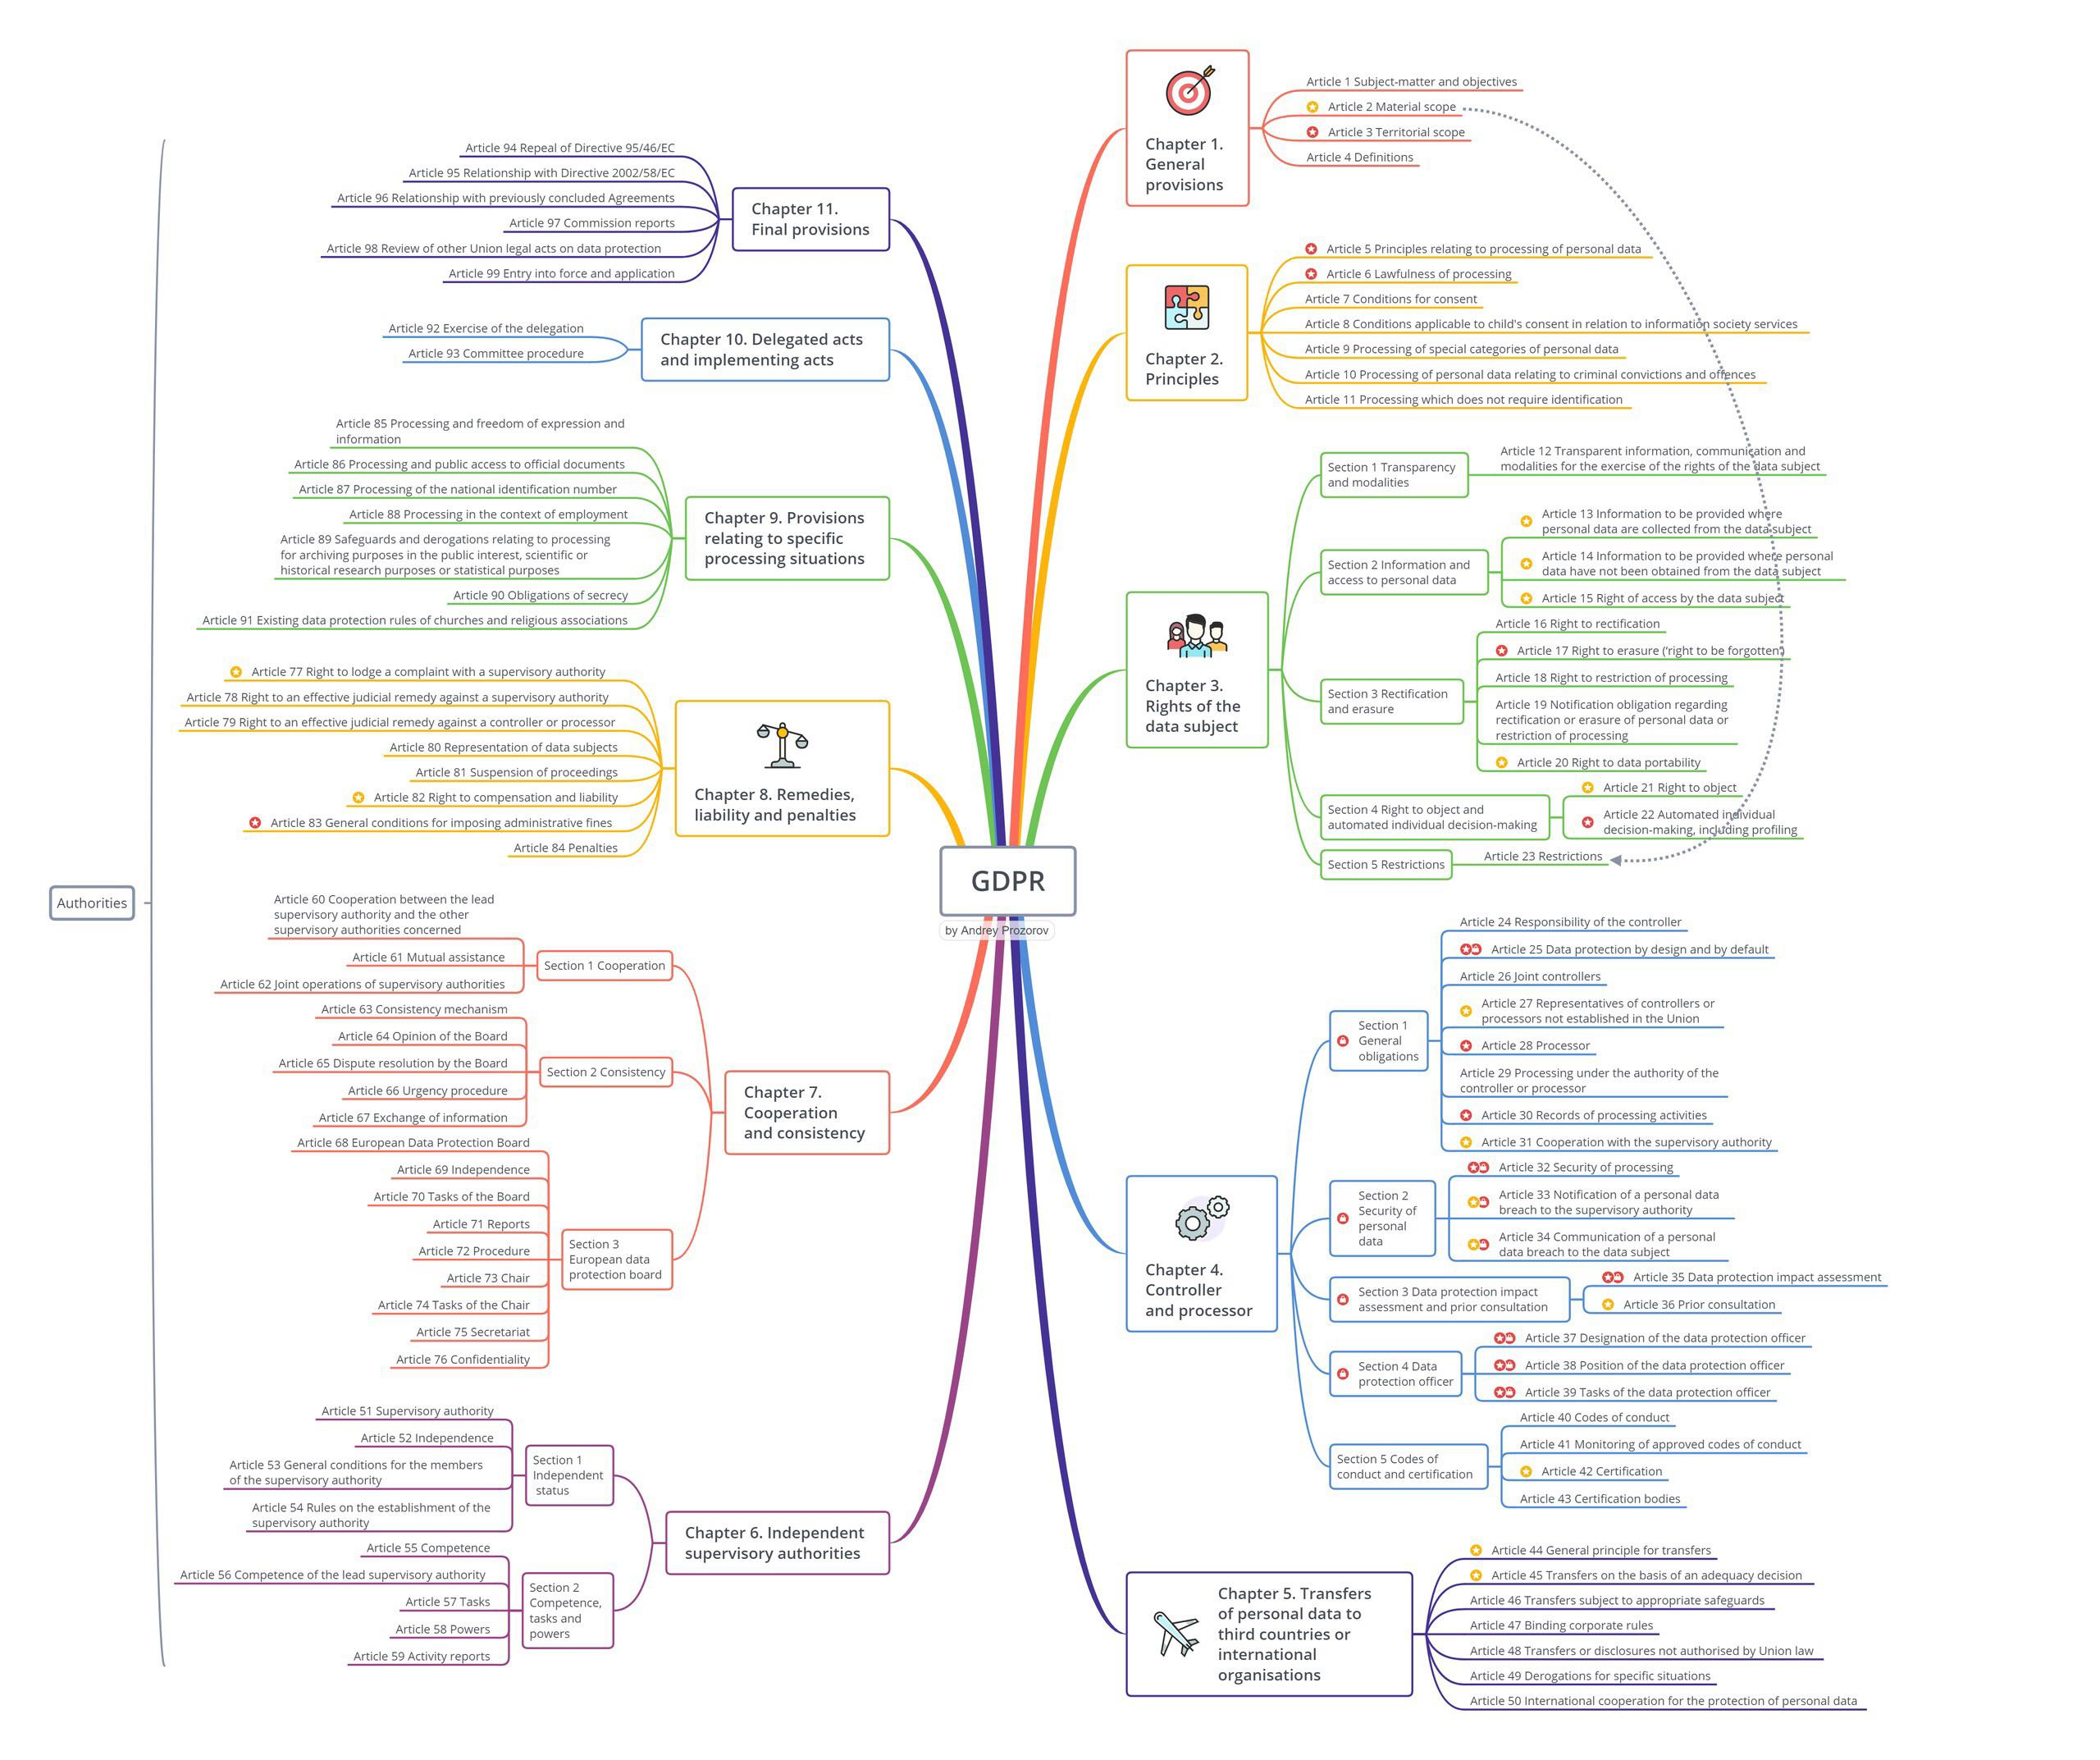 GDPR mindmap la mappa mentale per capire il GDPR